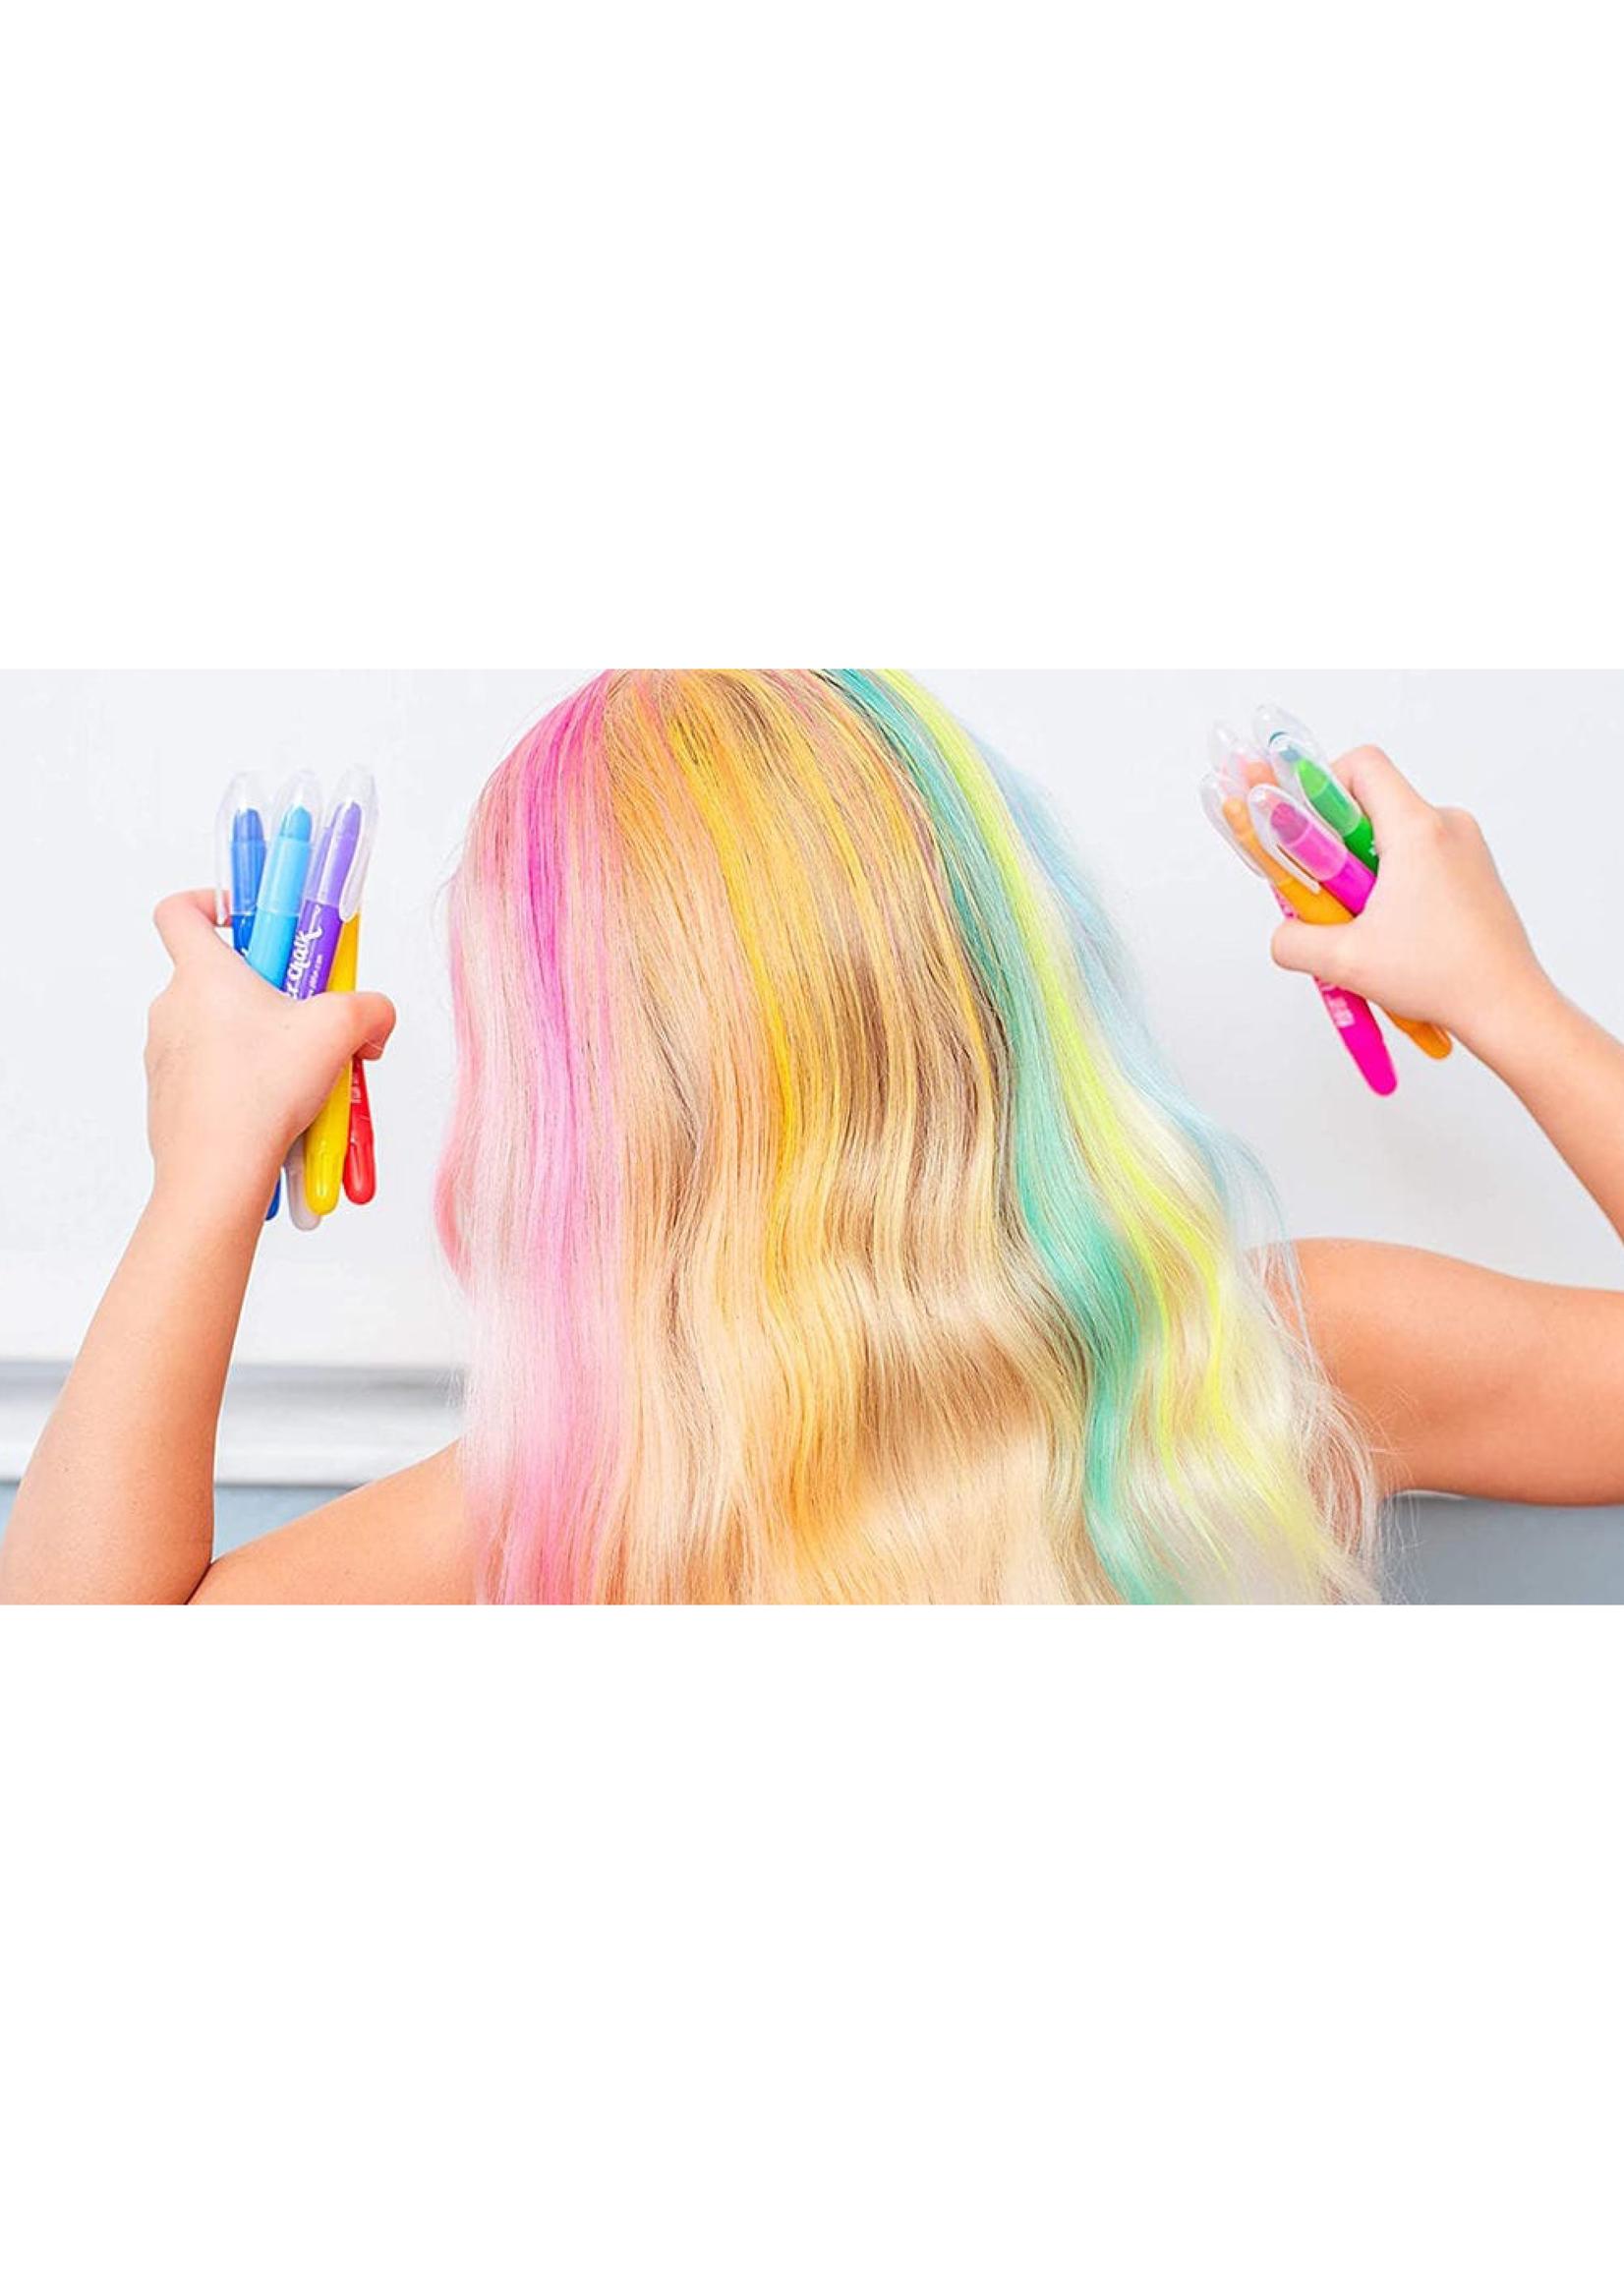 Skullduggery Glam Hair Chalk Studio